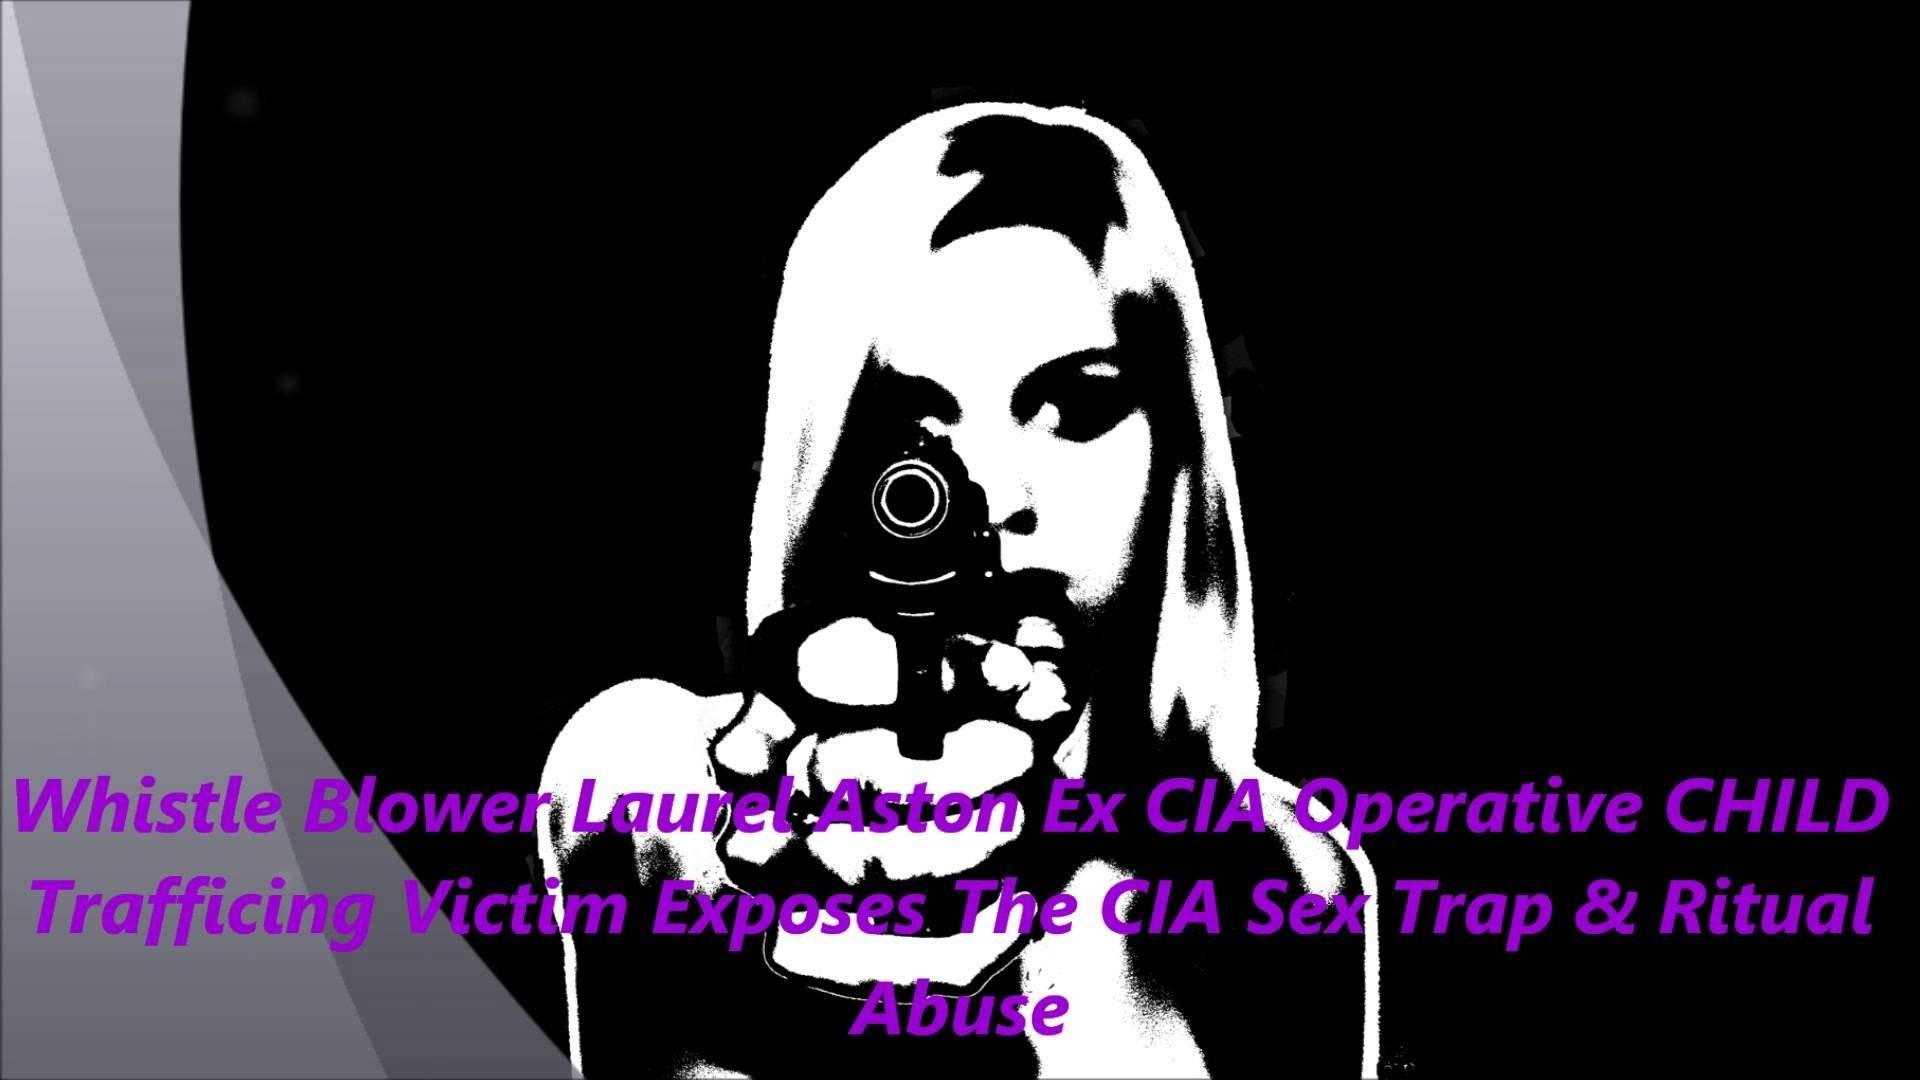 CIA Central Intelligence Agency crime usa america spy logo wallpaper      421700   WallpaperUP